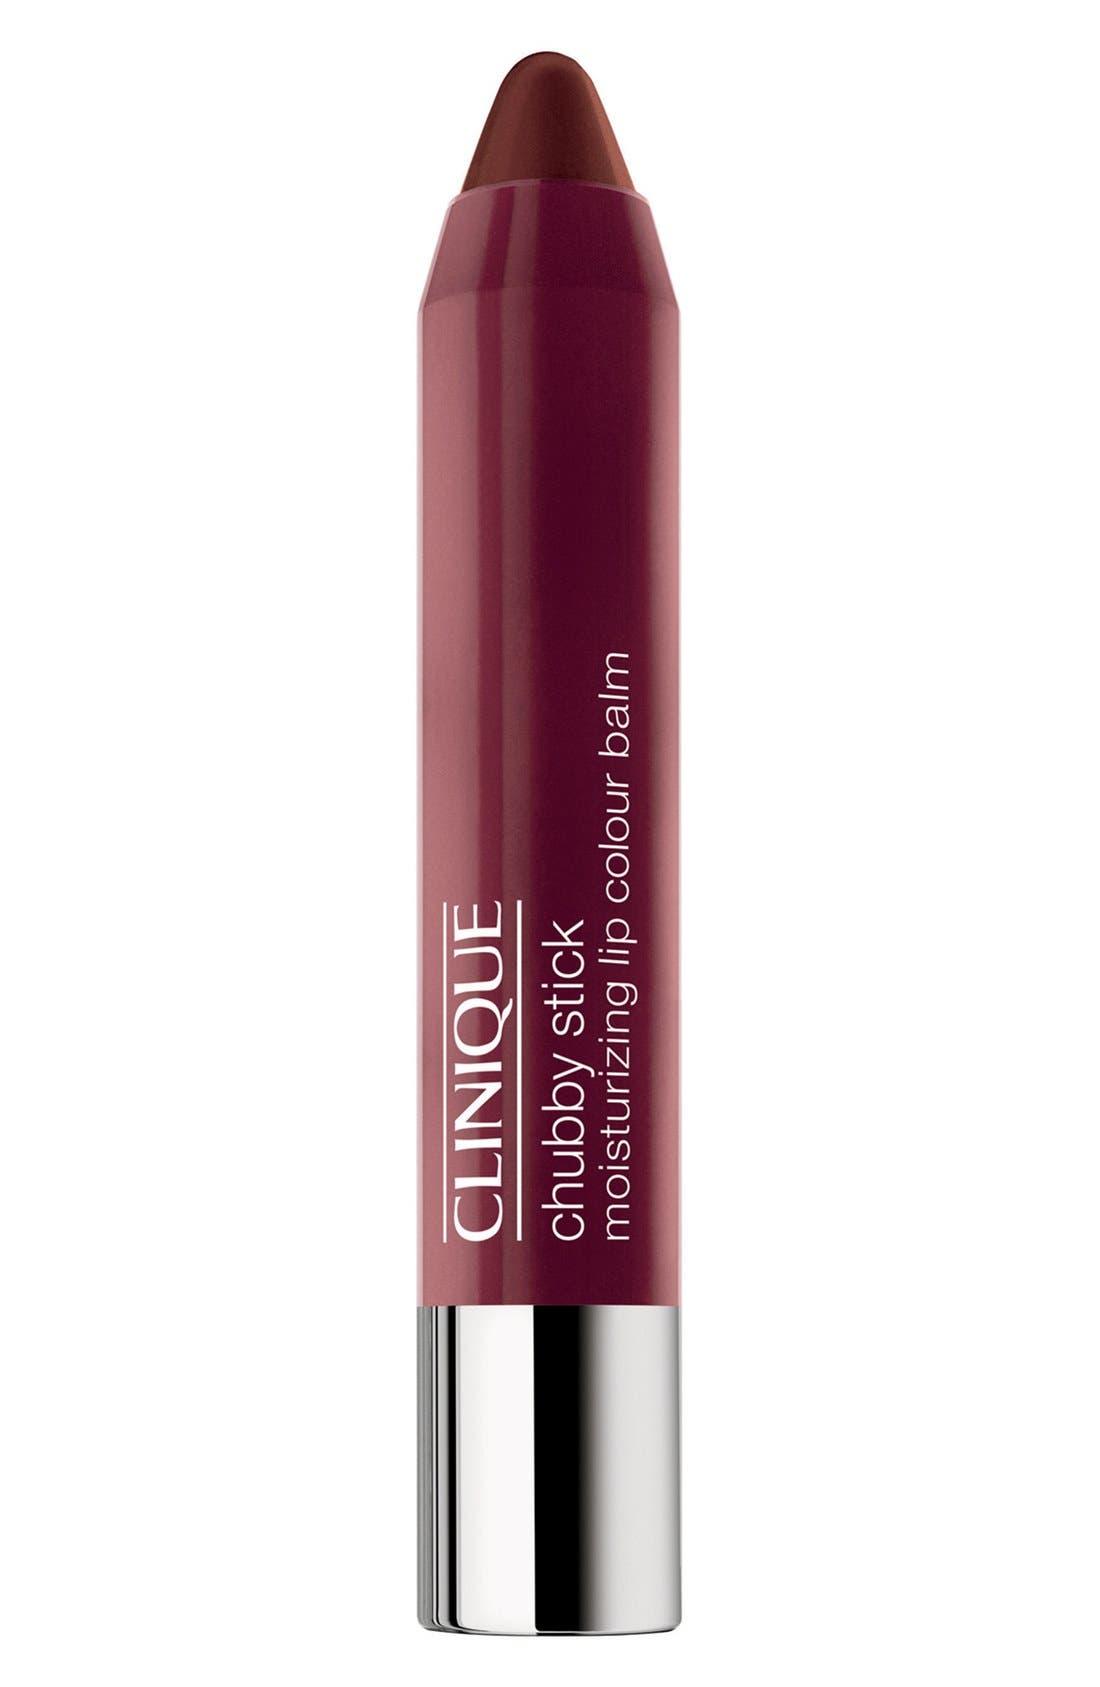 Chubby Stick Moisturizing Lip Color Balm,                         Main,                         color, 200